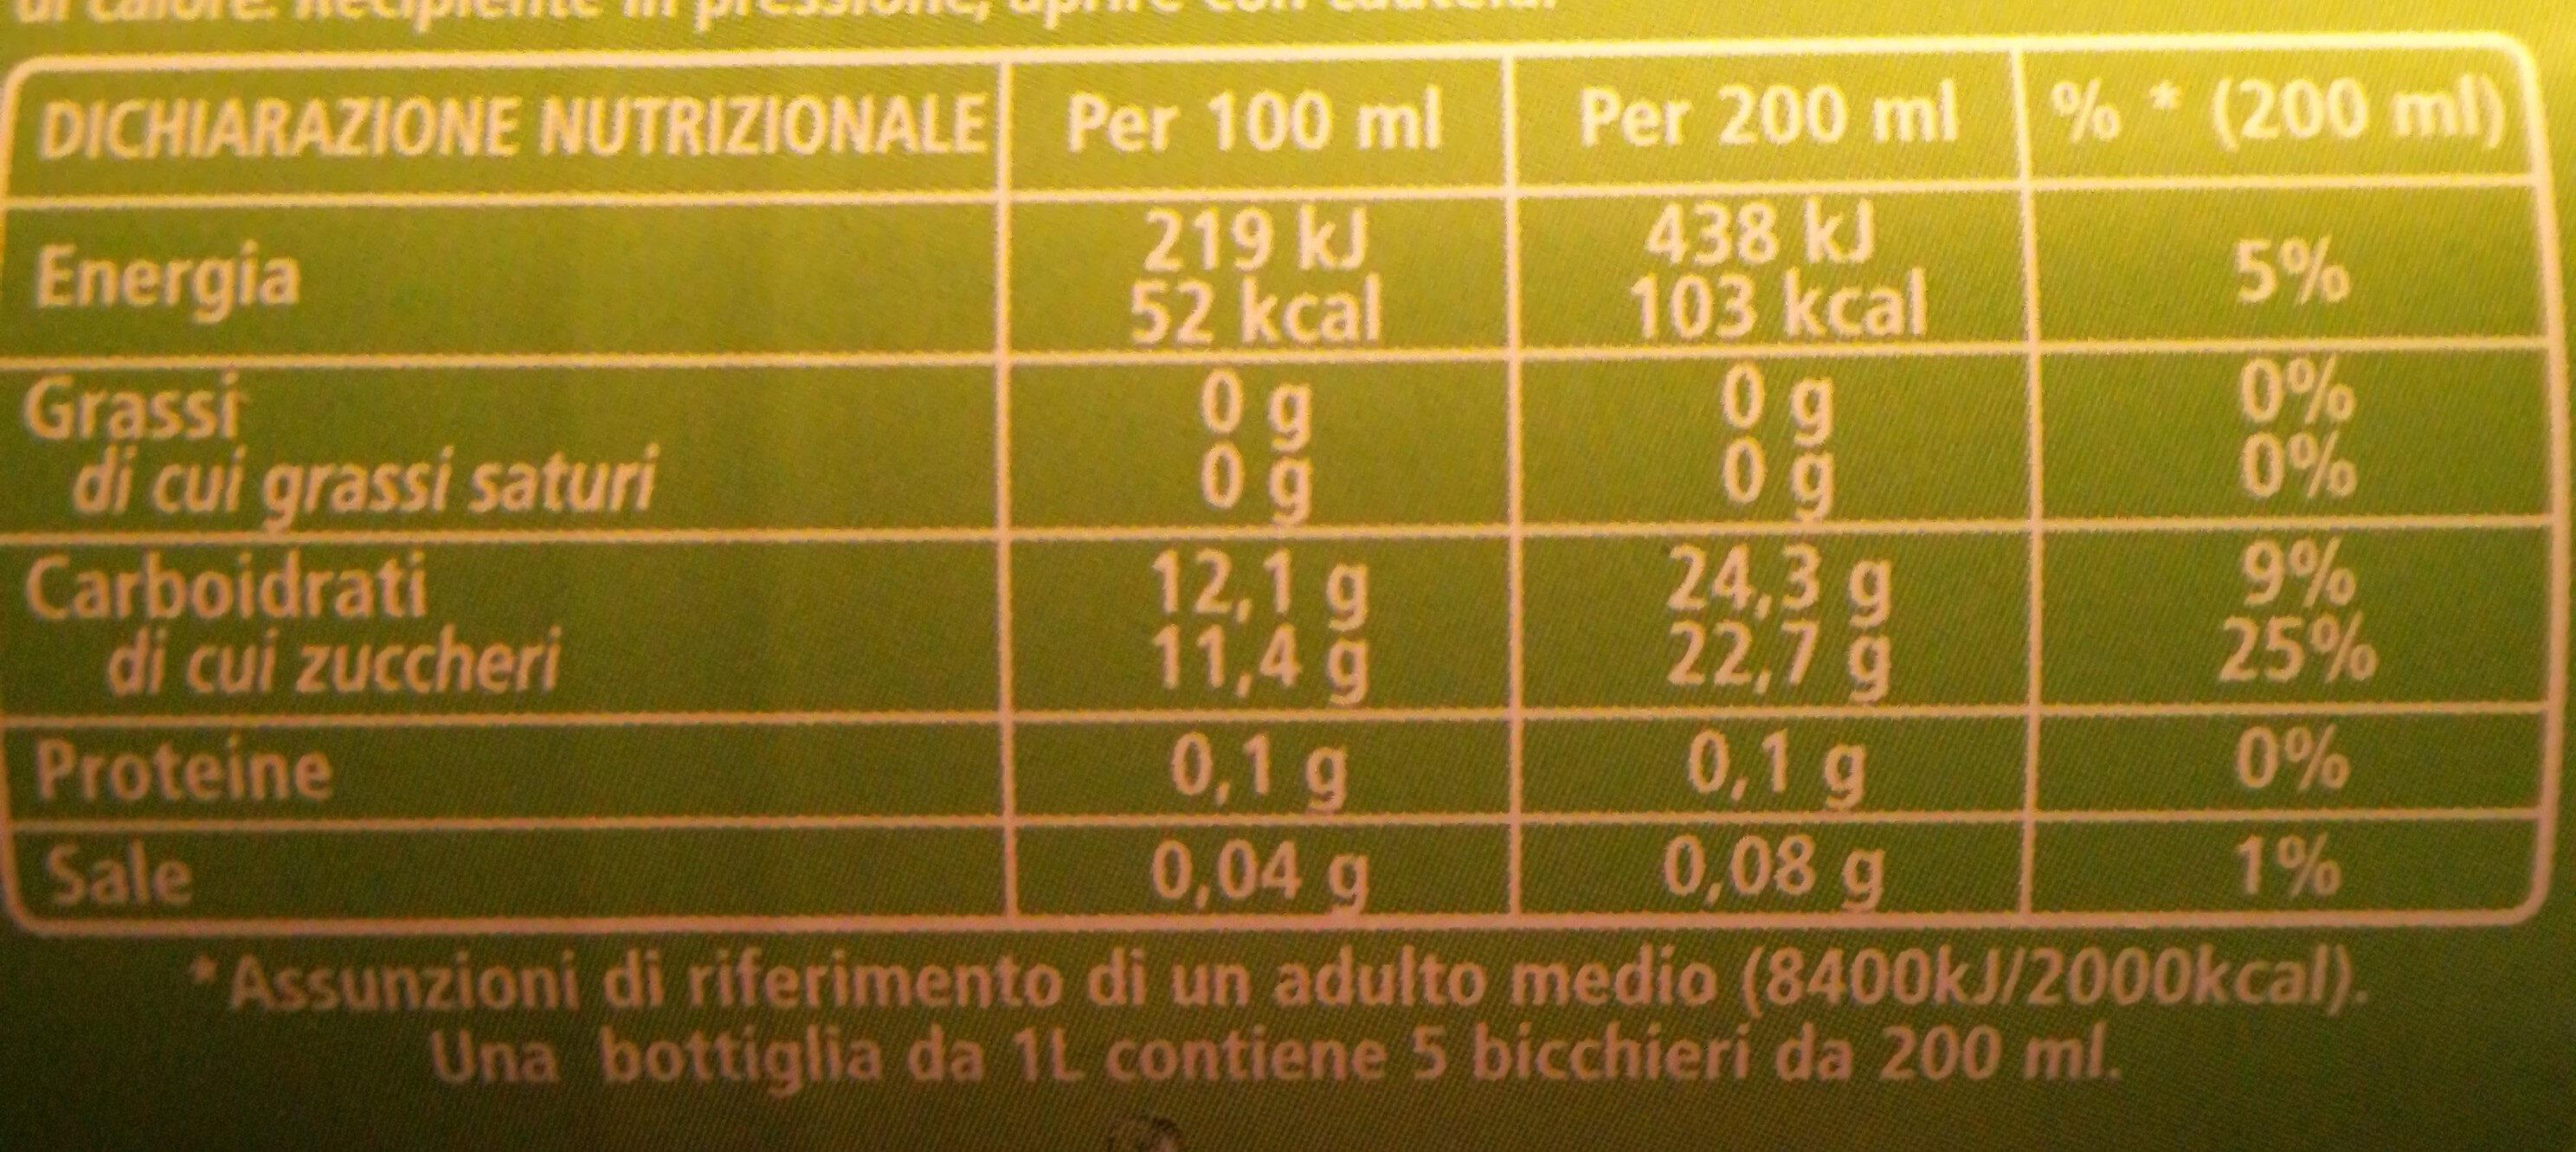 Limone pet - Valori nutrizionali - it